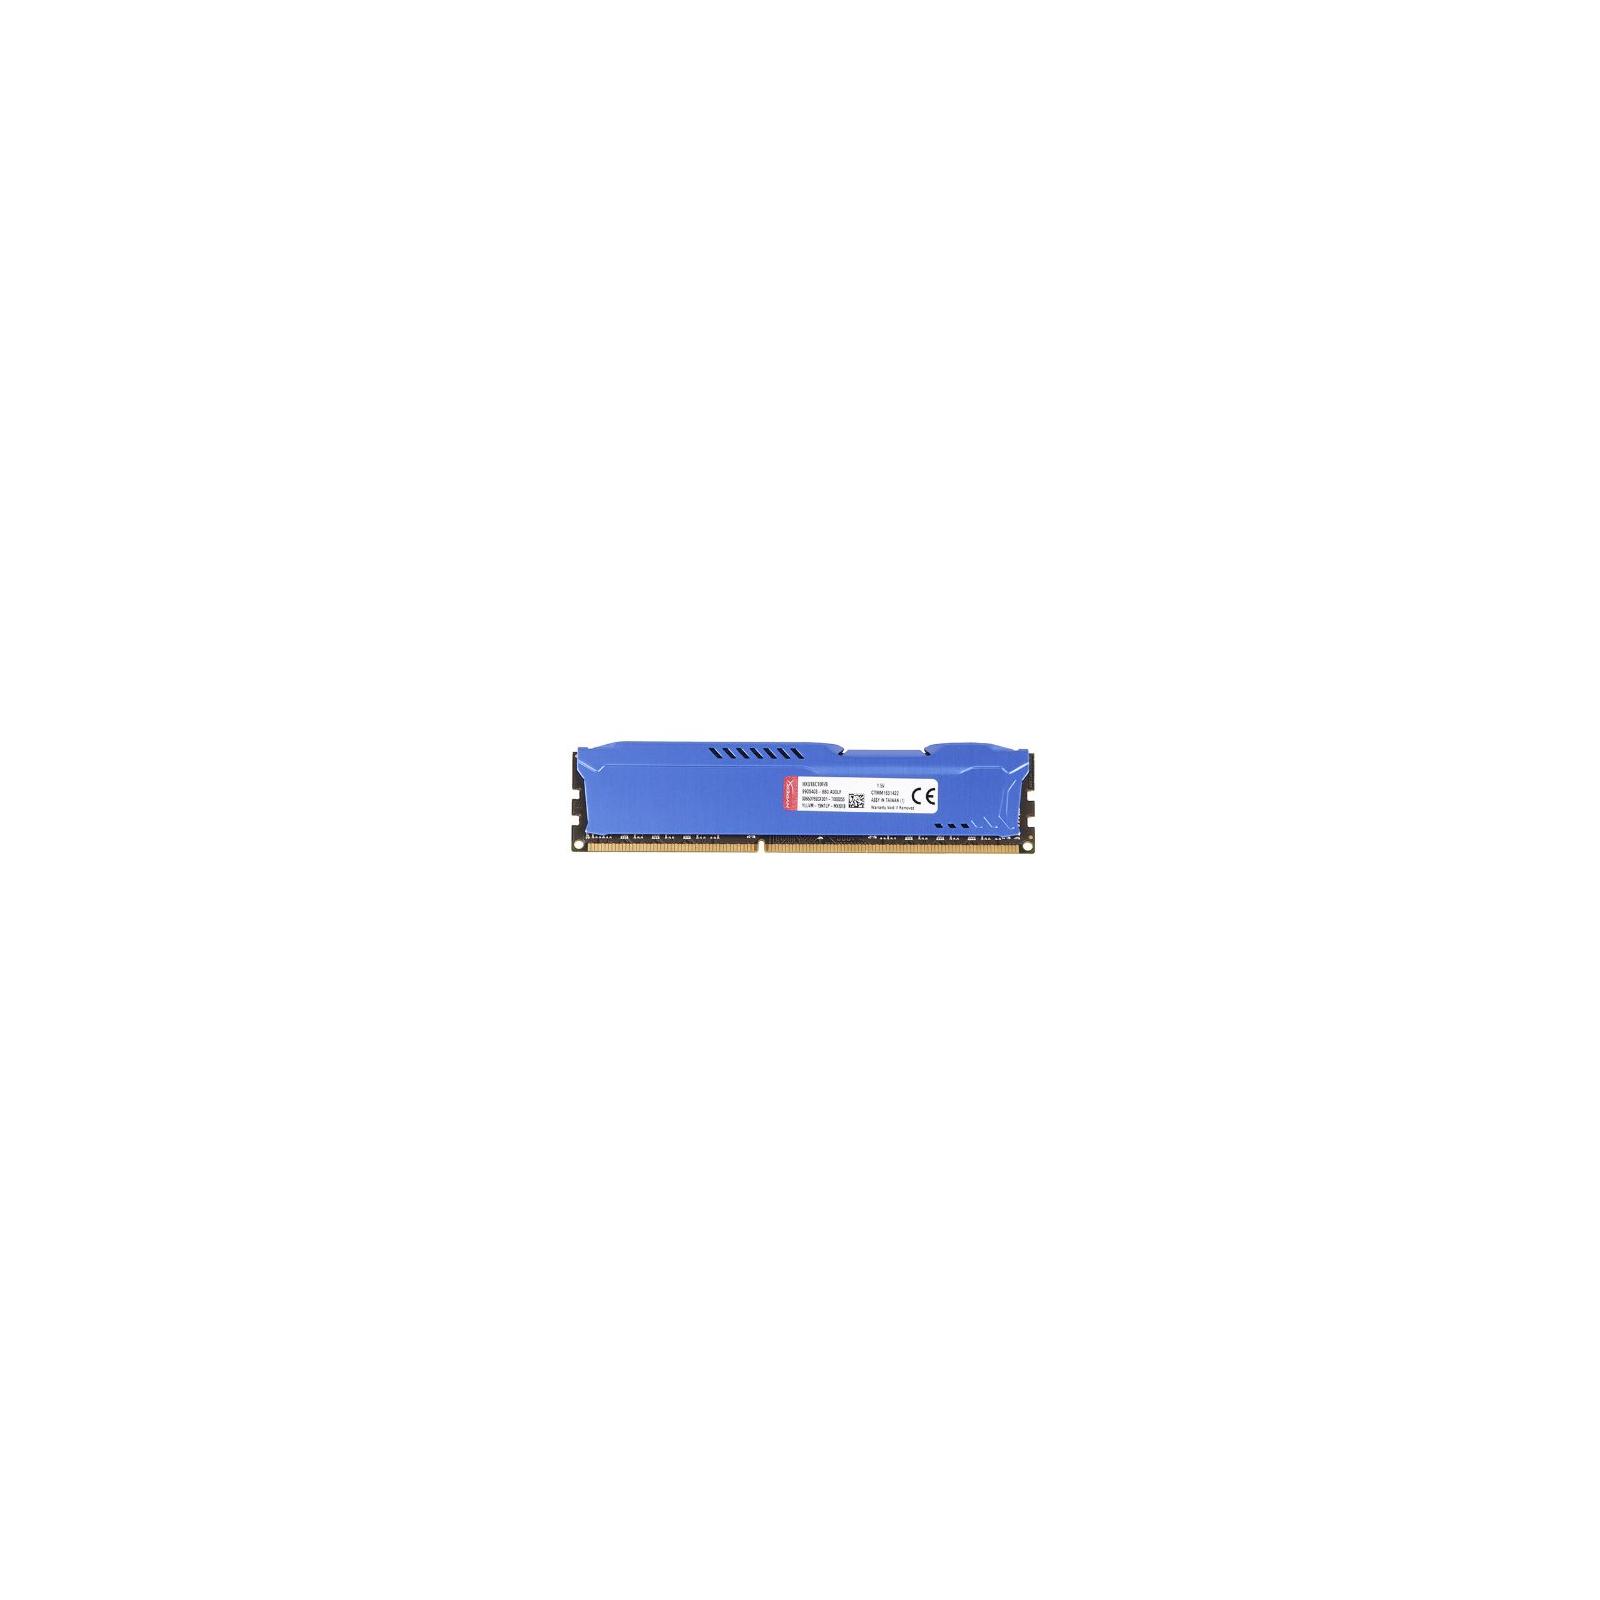 Модуль памяти для компьютера DDR3 8Gb 1866 MHz HyperX Fury Blu Kingston (HX318C10F/8) изображение 3